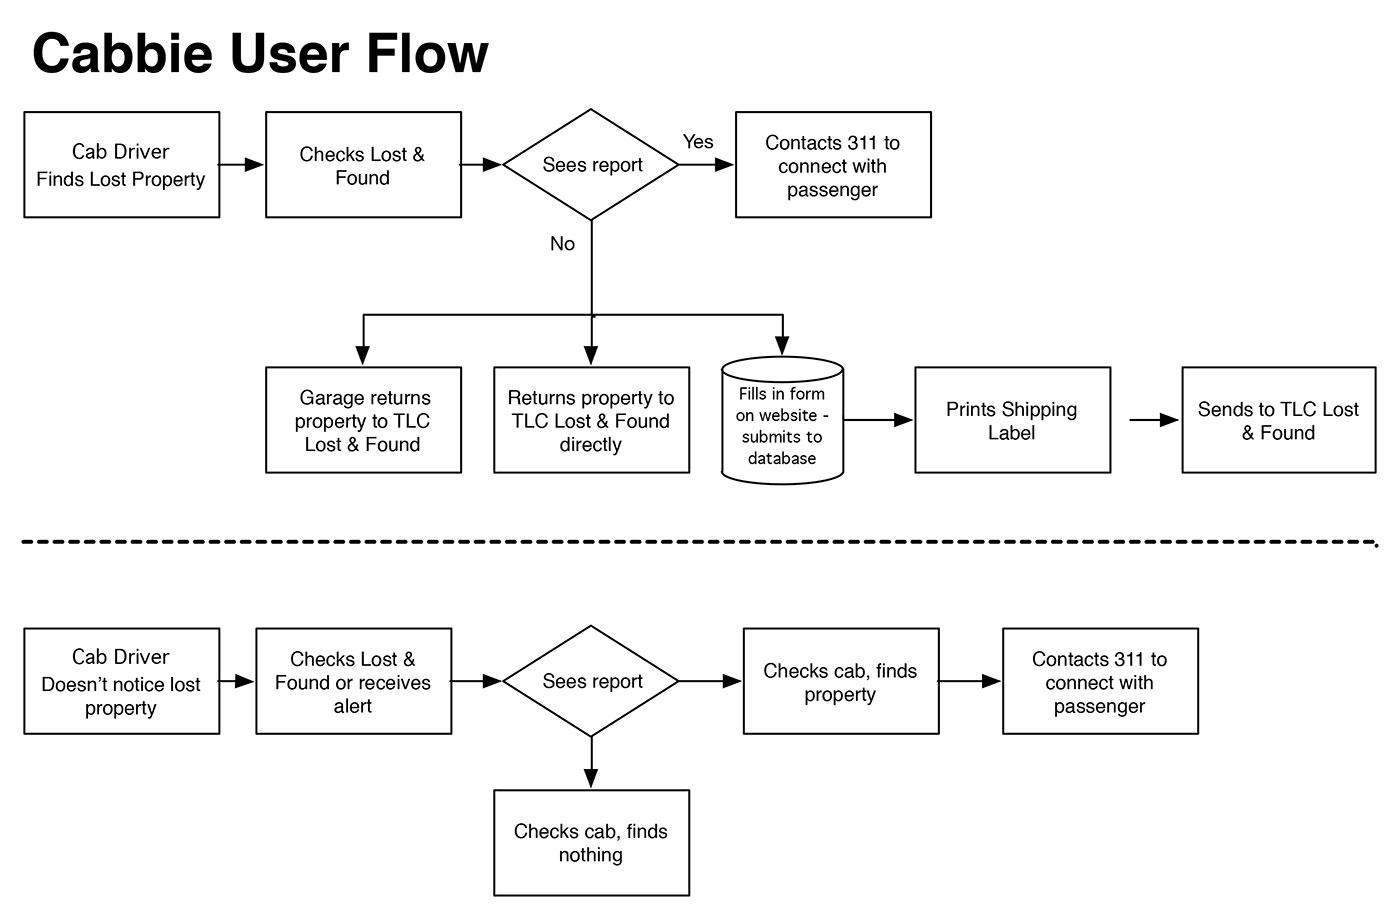 Cabbie-User-Flow